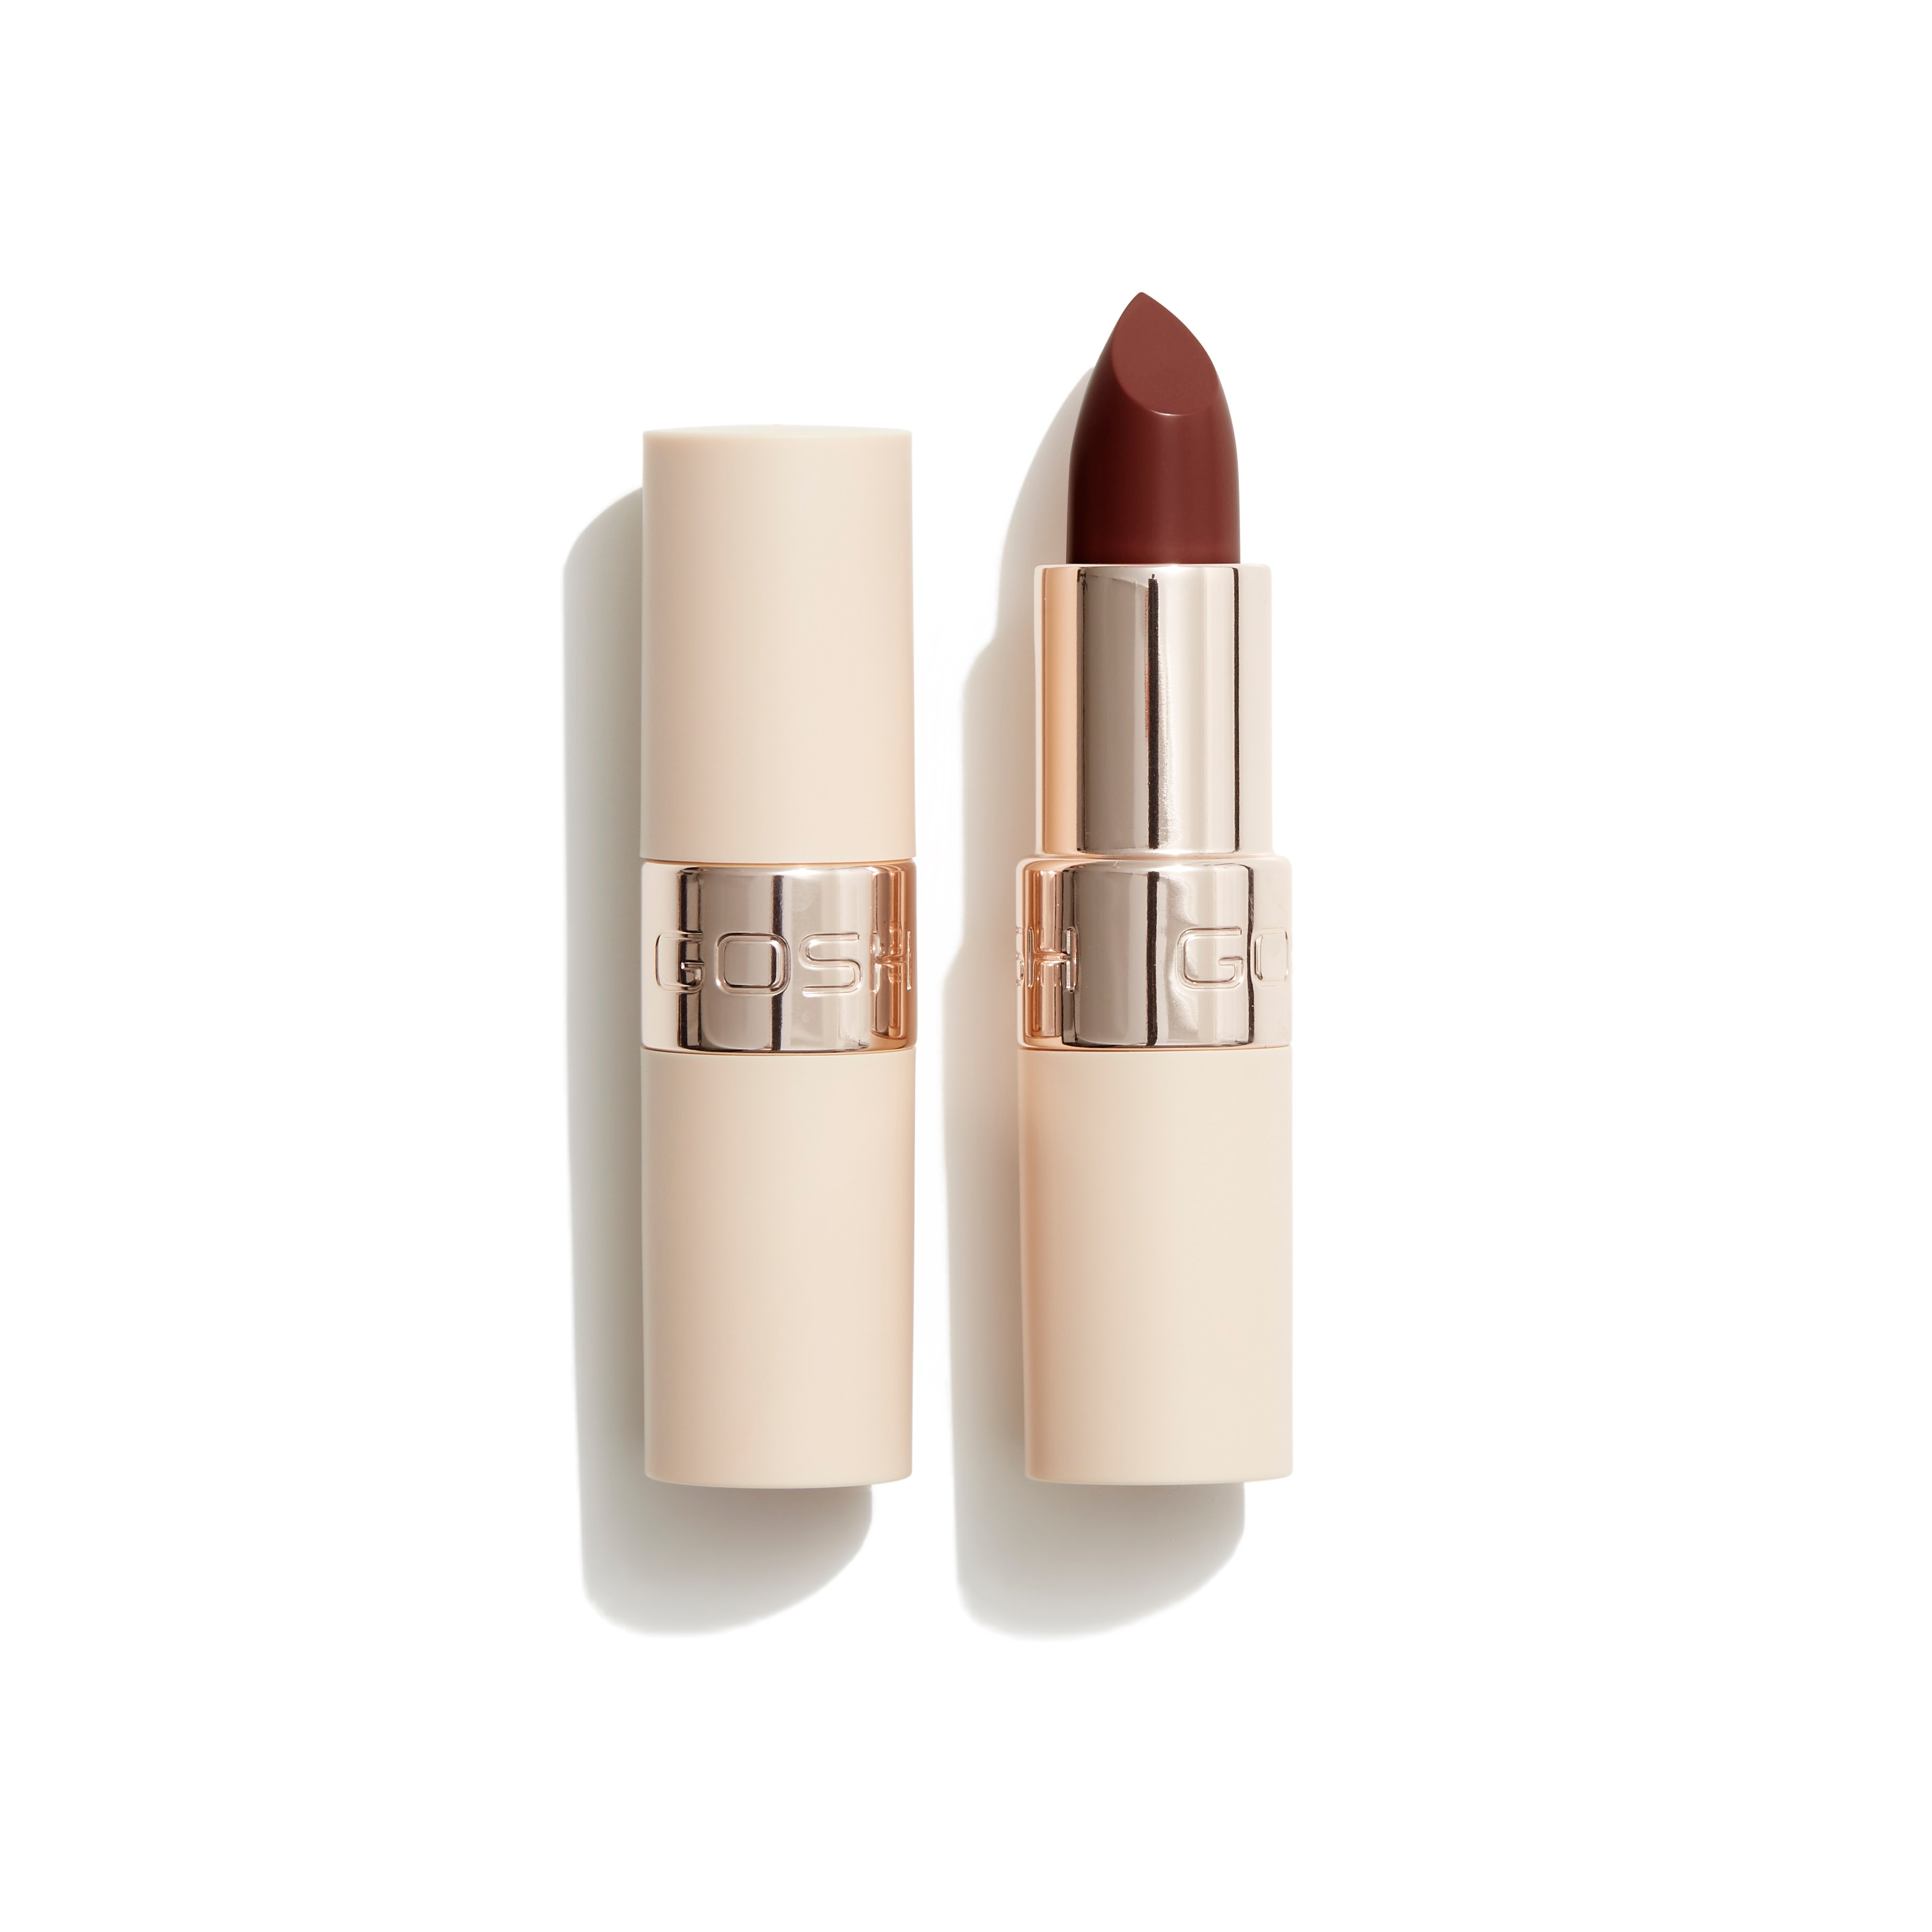 GOSH Copenhagen - Luxury Nude Lips - 006 Naked